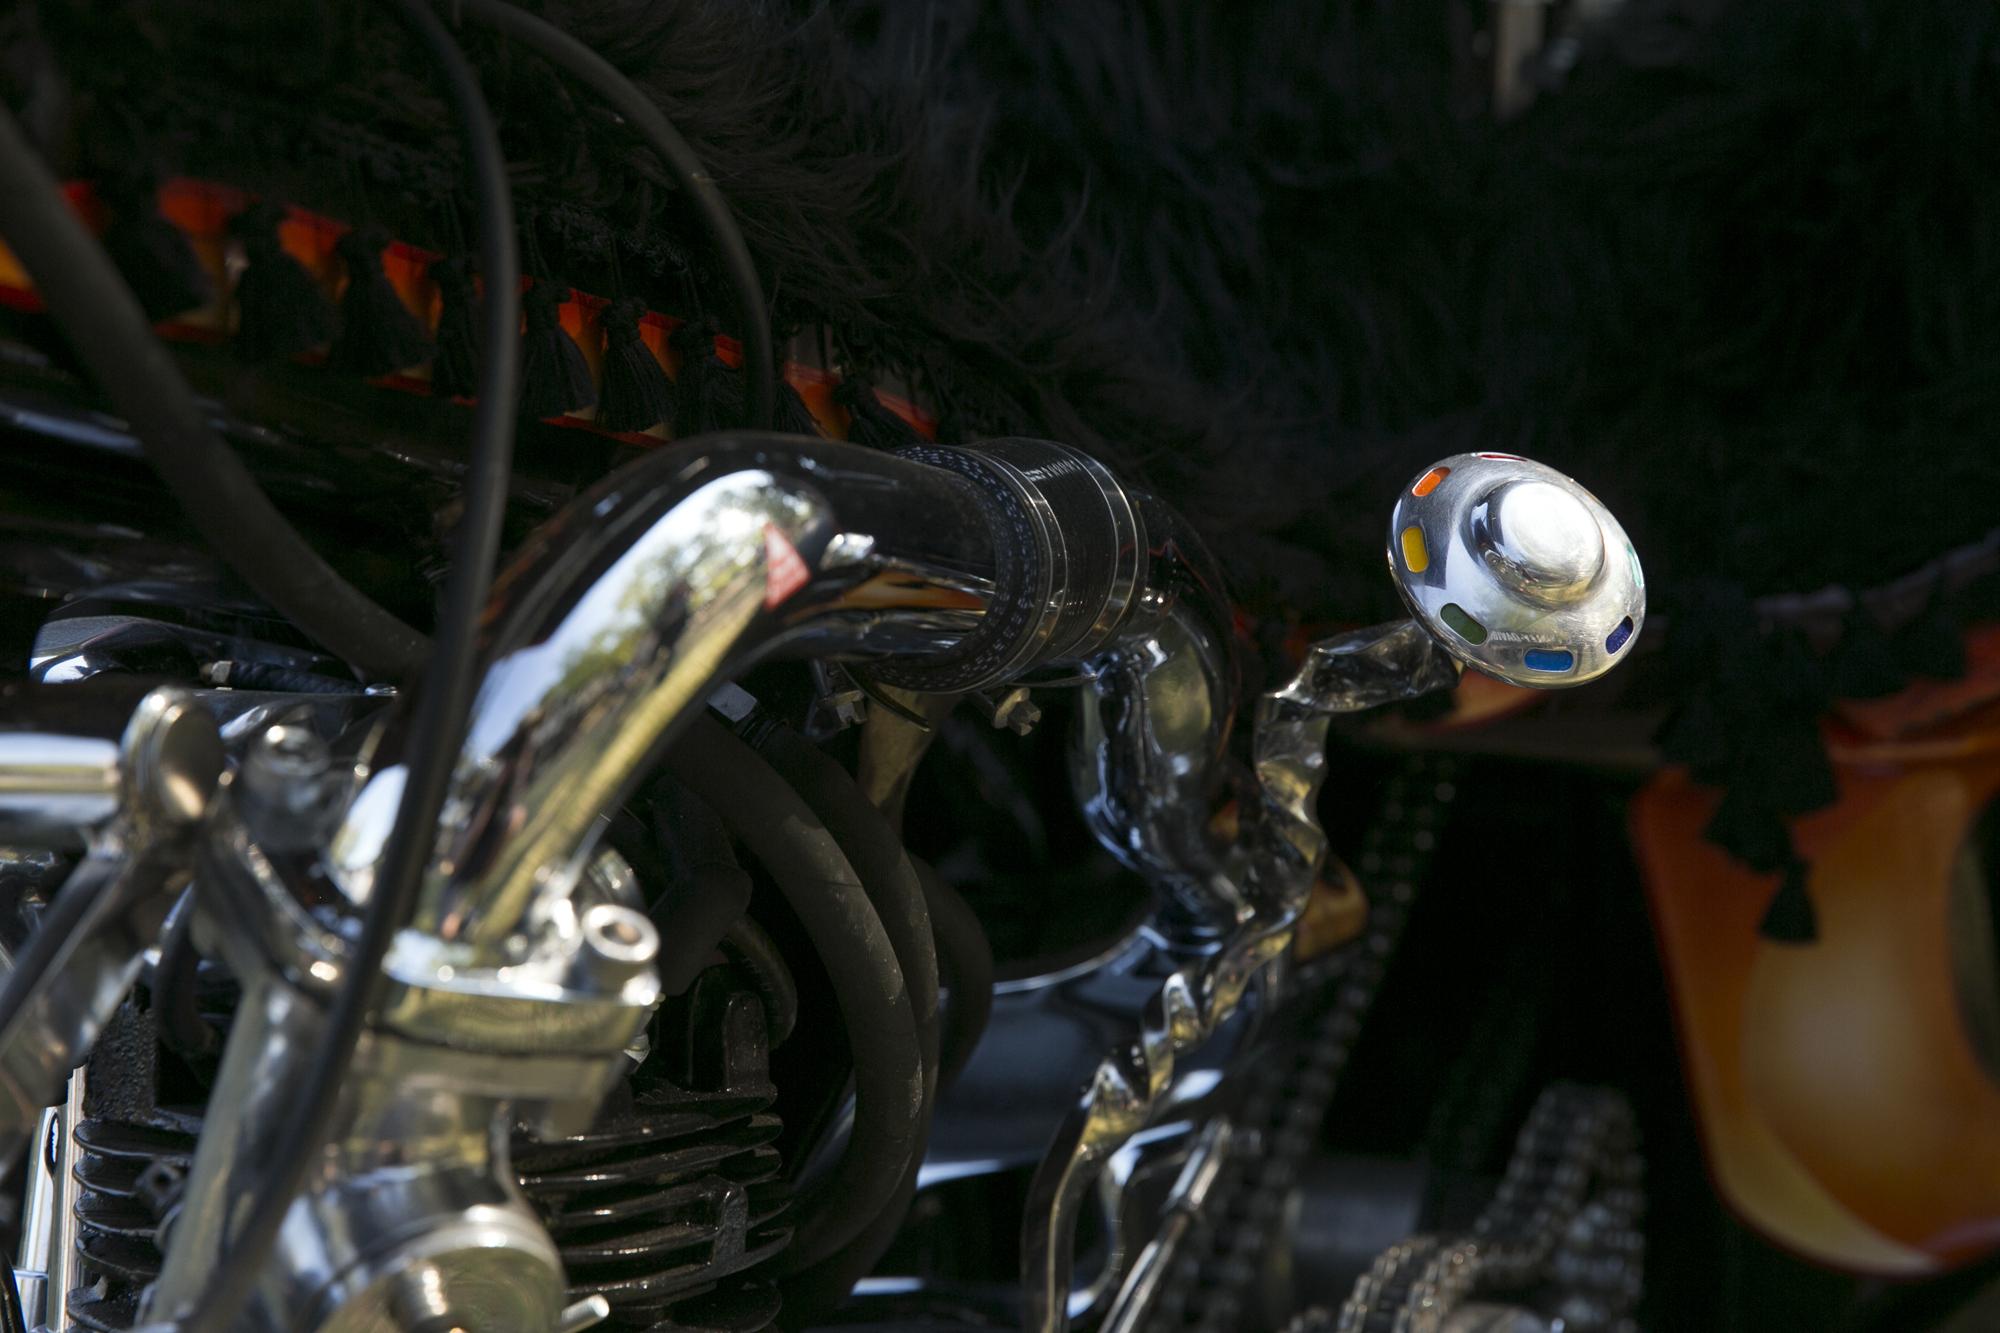 Born Free 8 Motorcycle Show-083.jpg